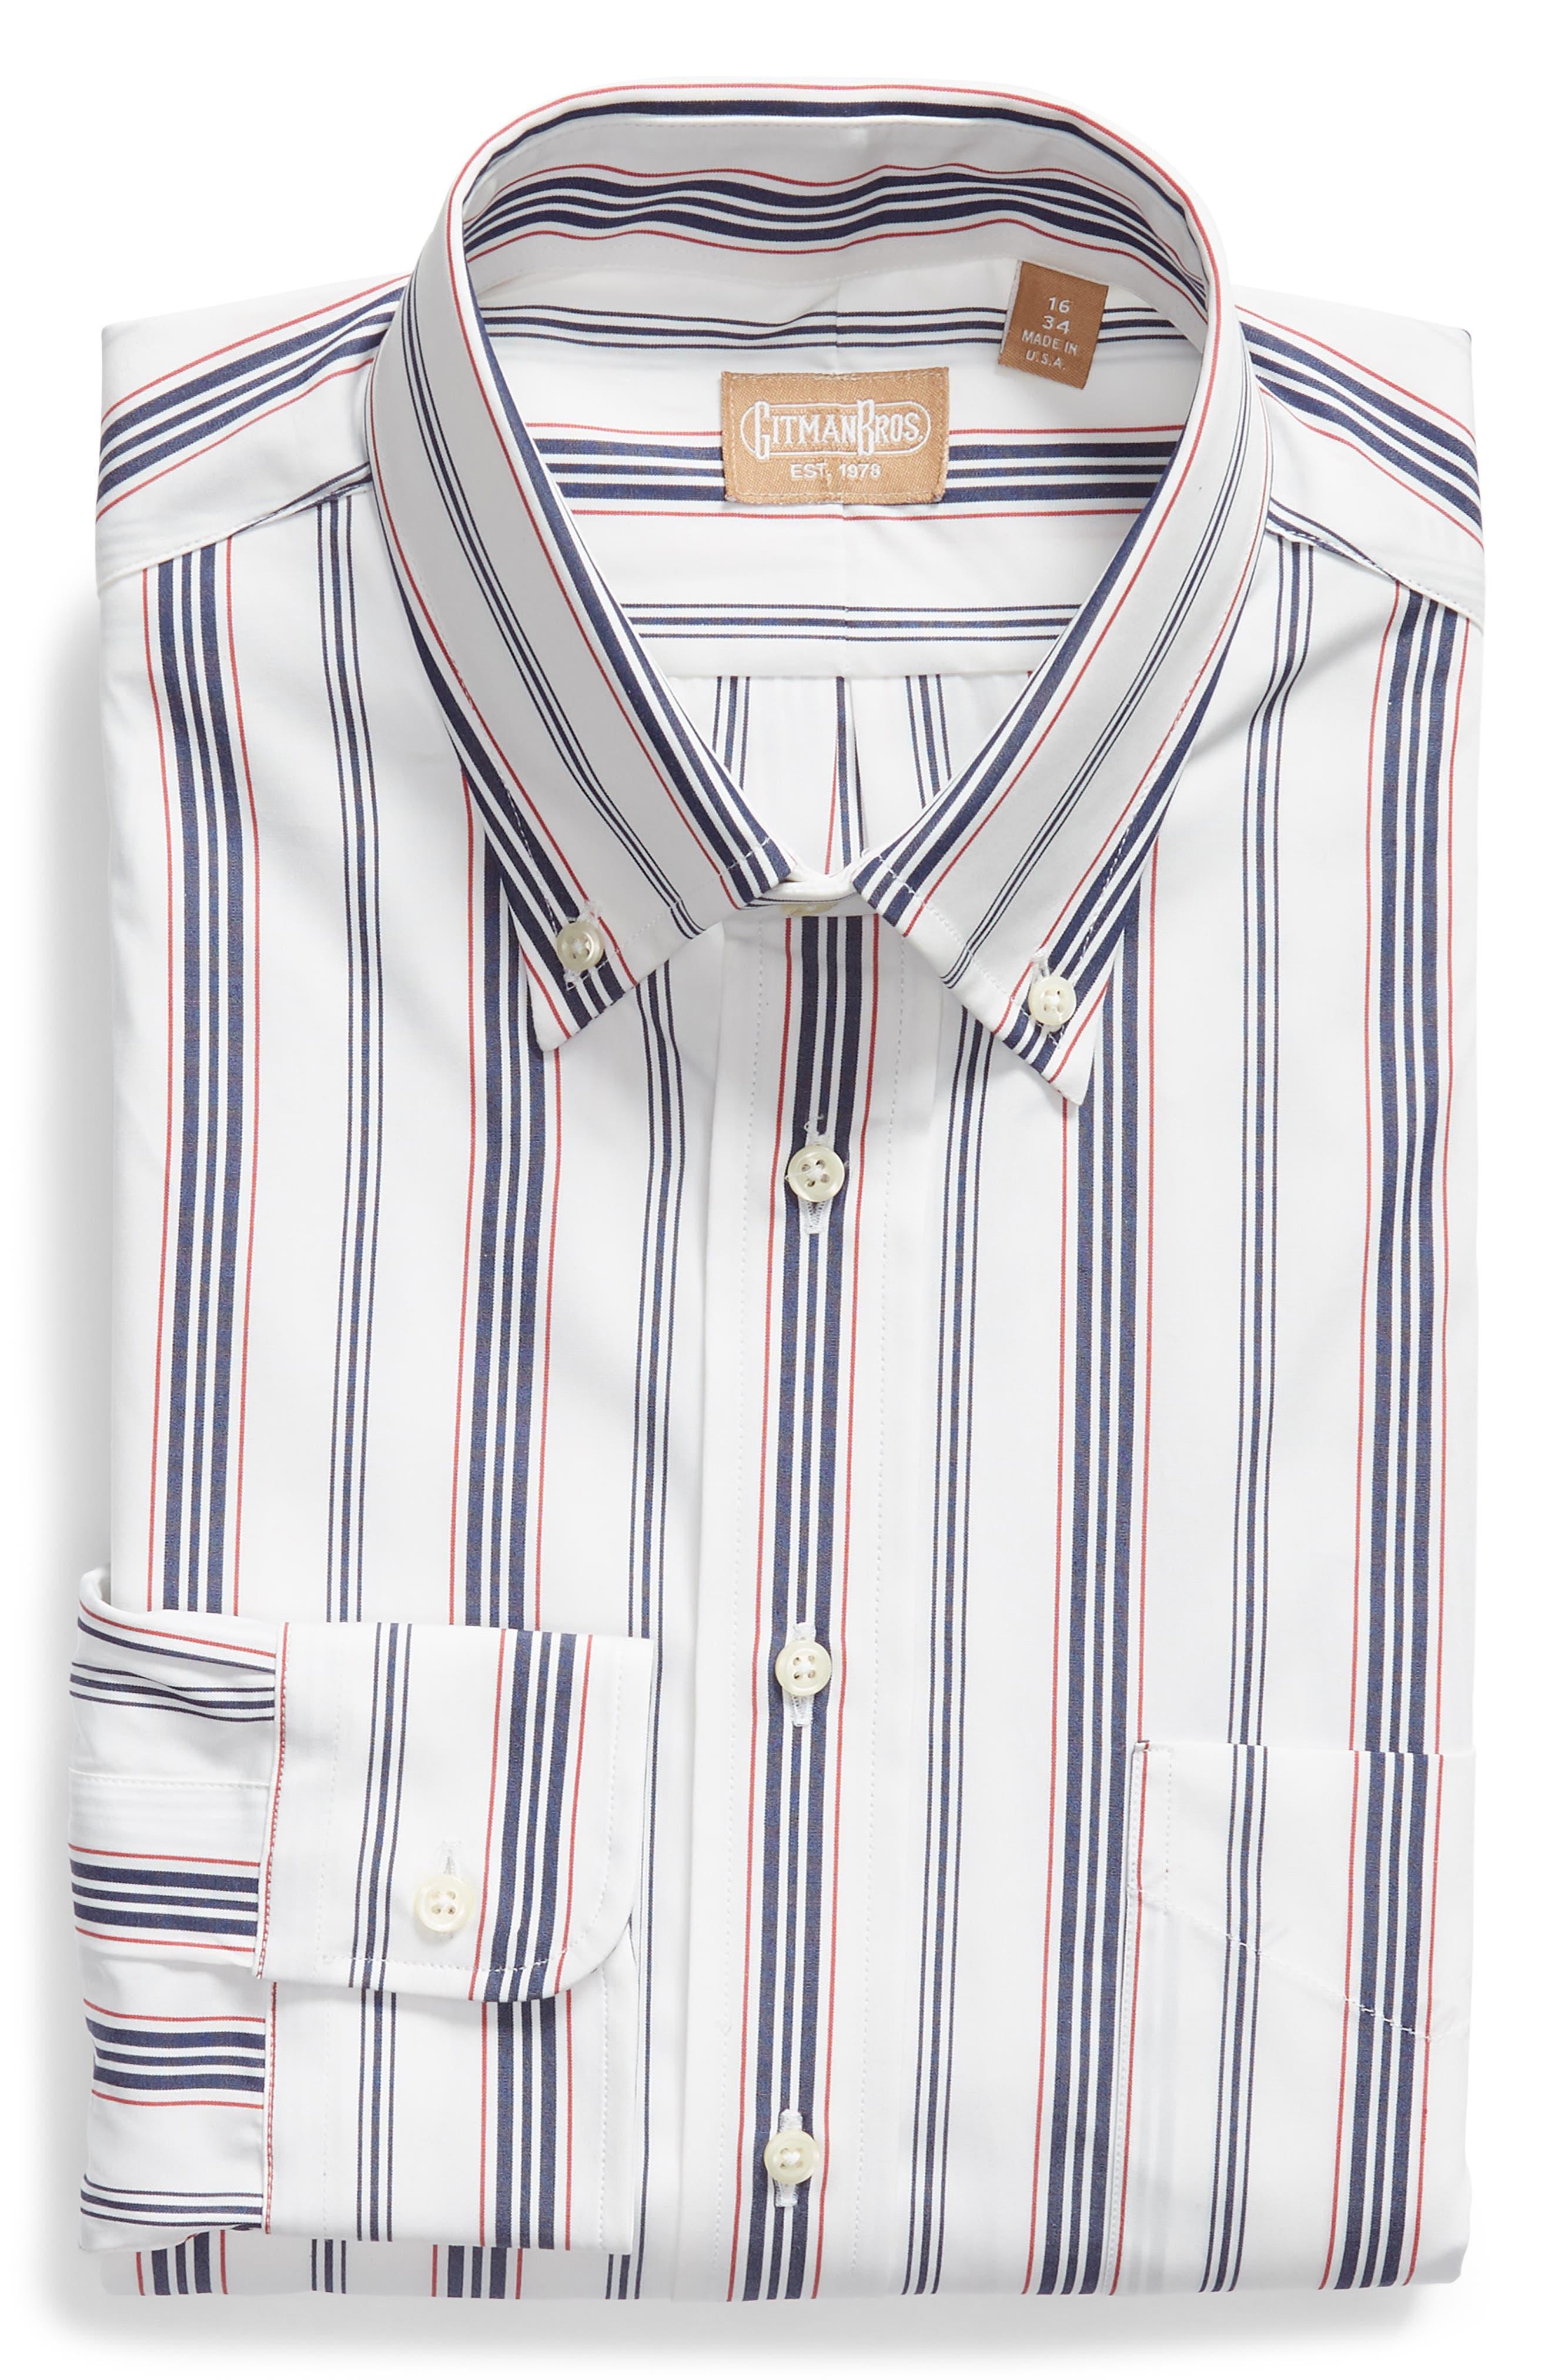 Tailored Fit Stripe Dress Shirt,                             Alternate thumbnail 5, color,                             WHITE/ BLUE